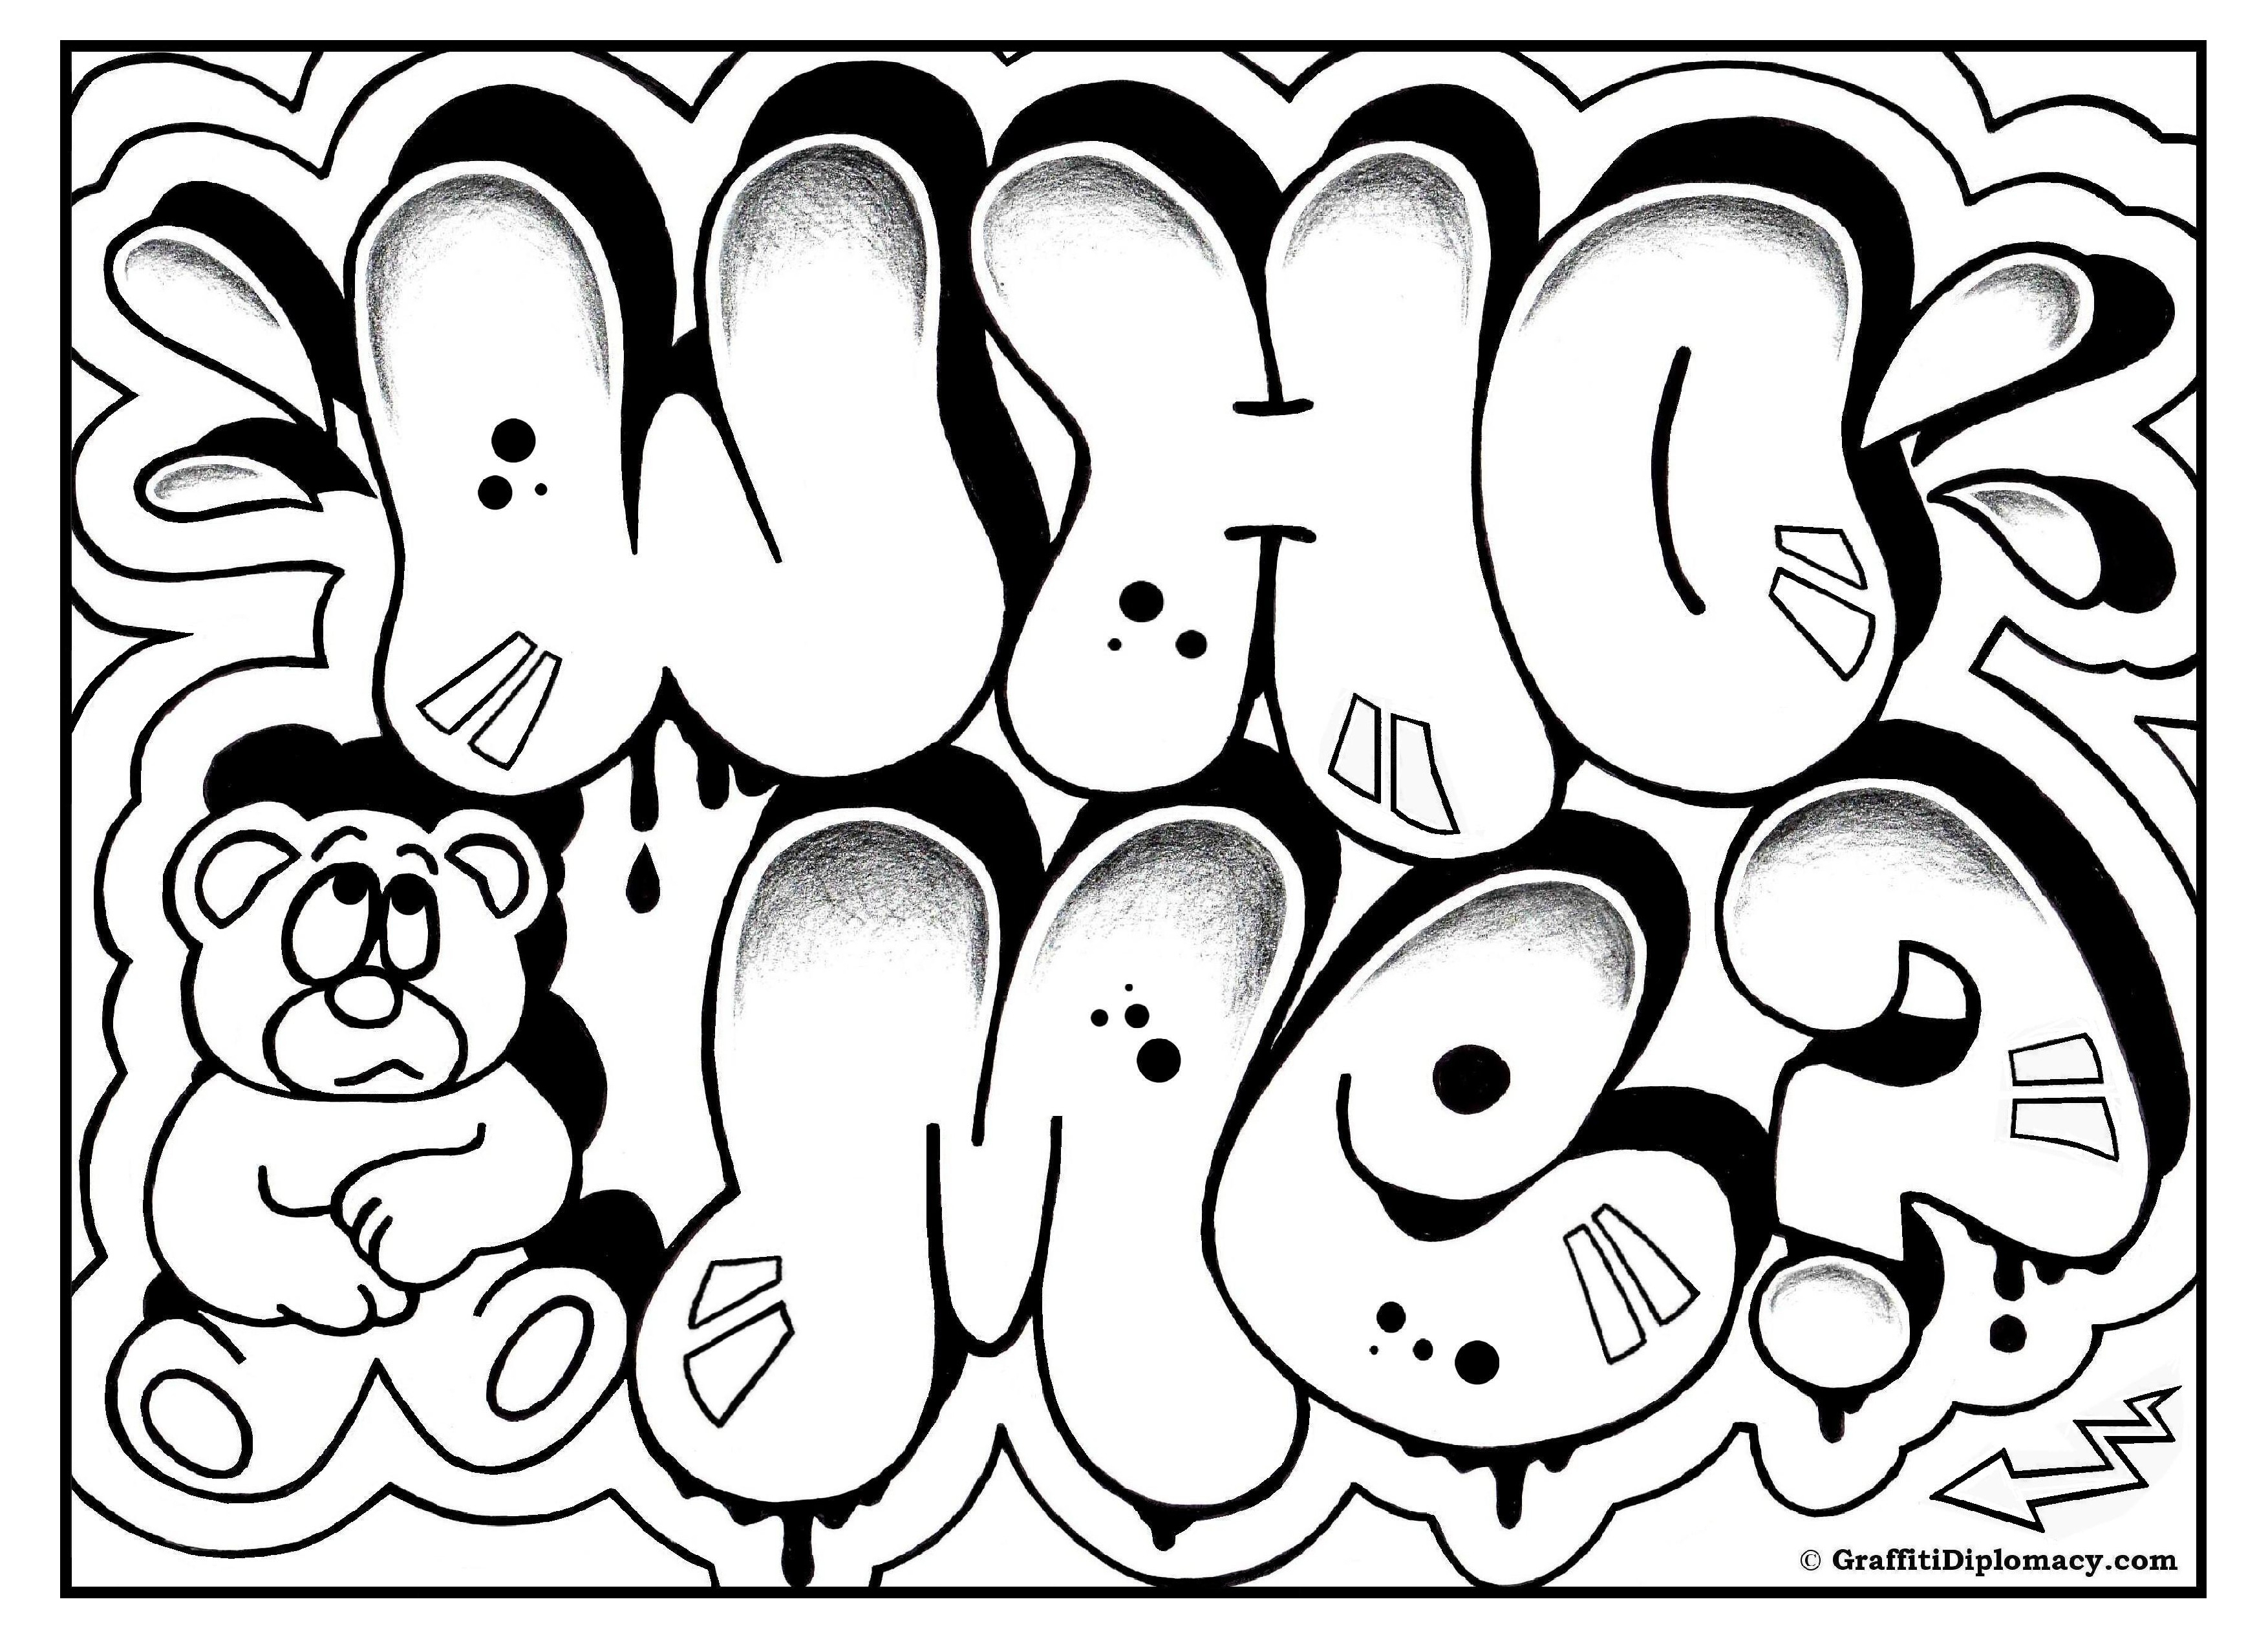 Block Graffiti Alphabet - Photos Alphabet Collections